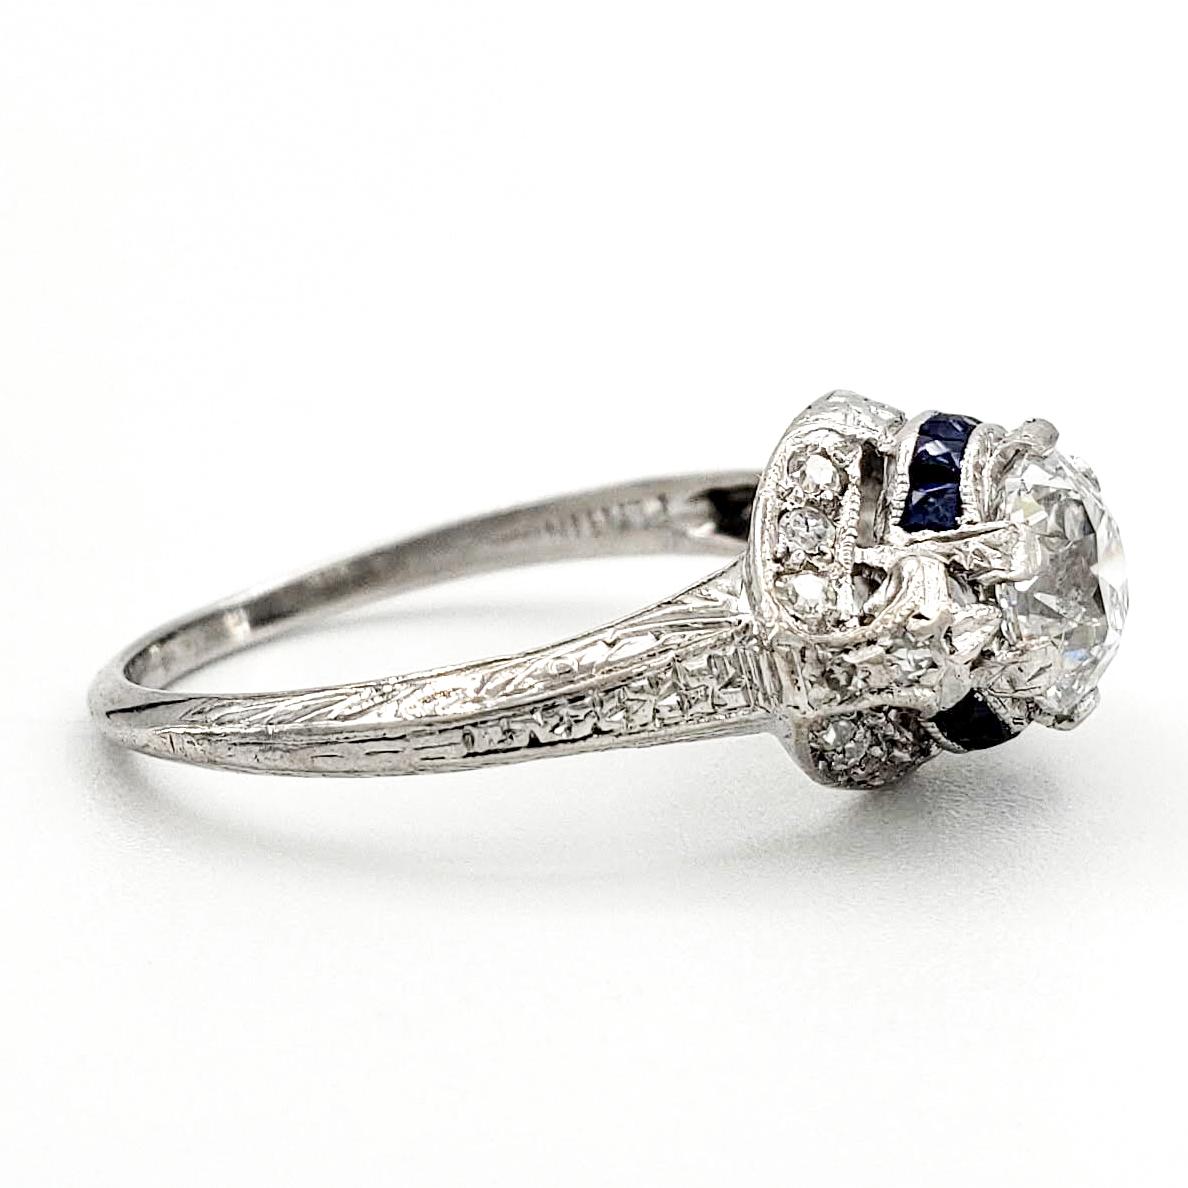 Vintage Platinum Engagement Ring With 0.91 Carat Old European Cut Diamond GIA – E SI2